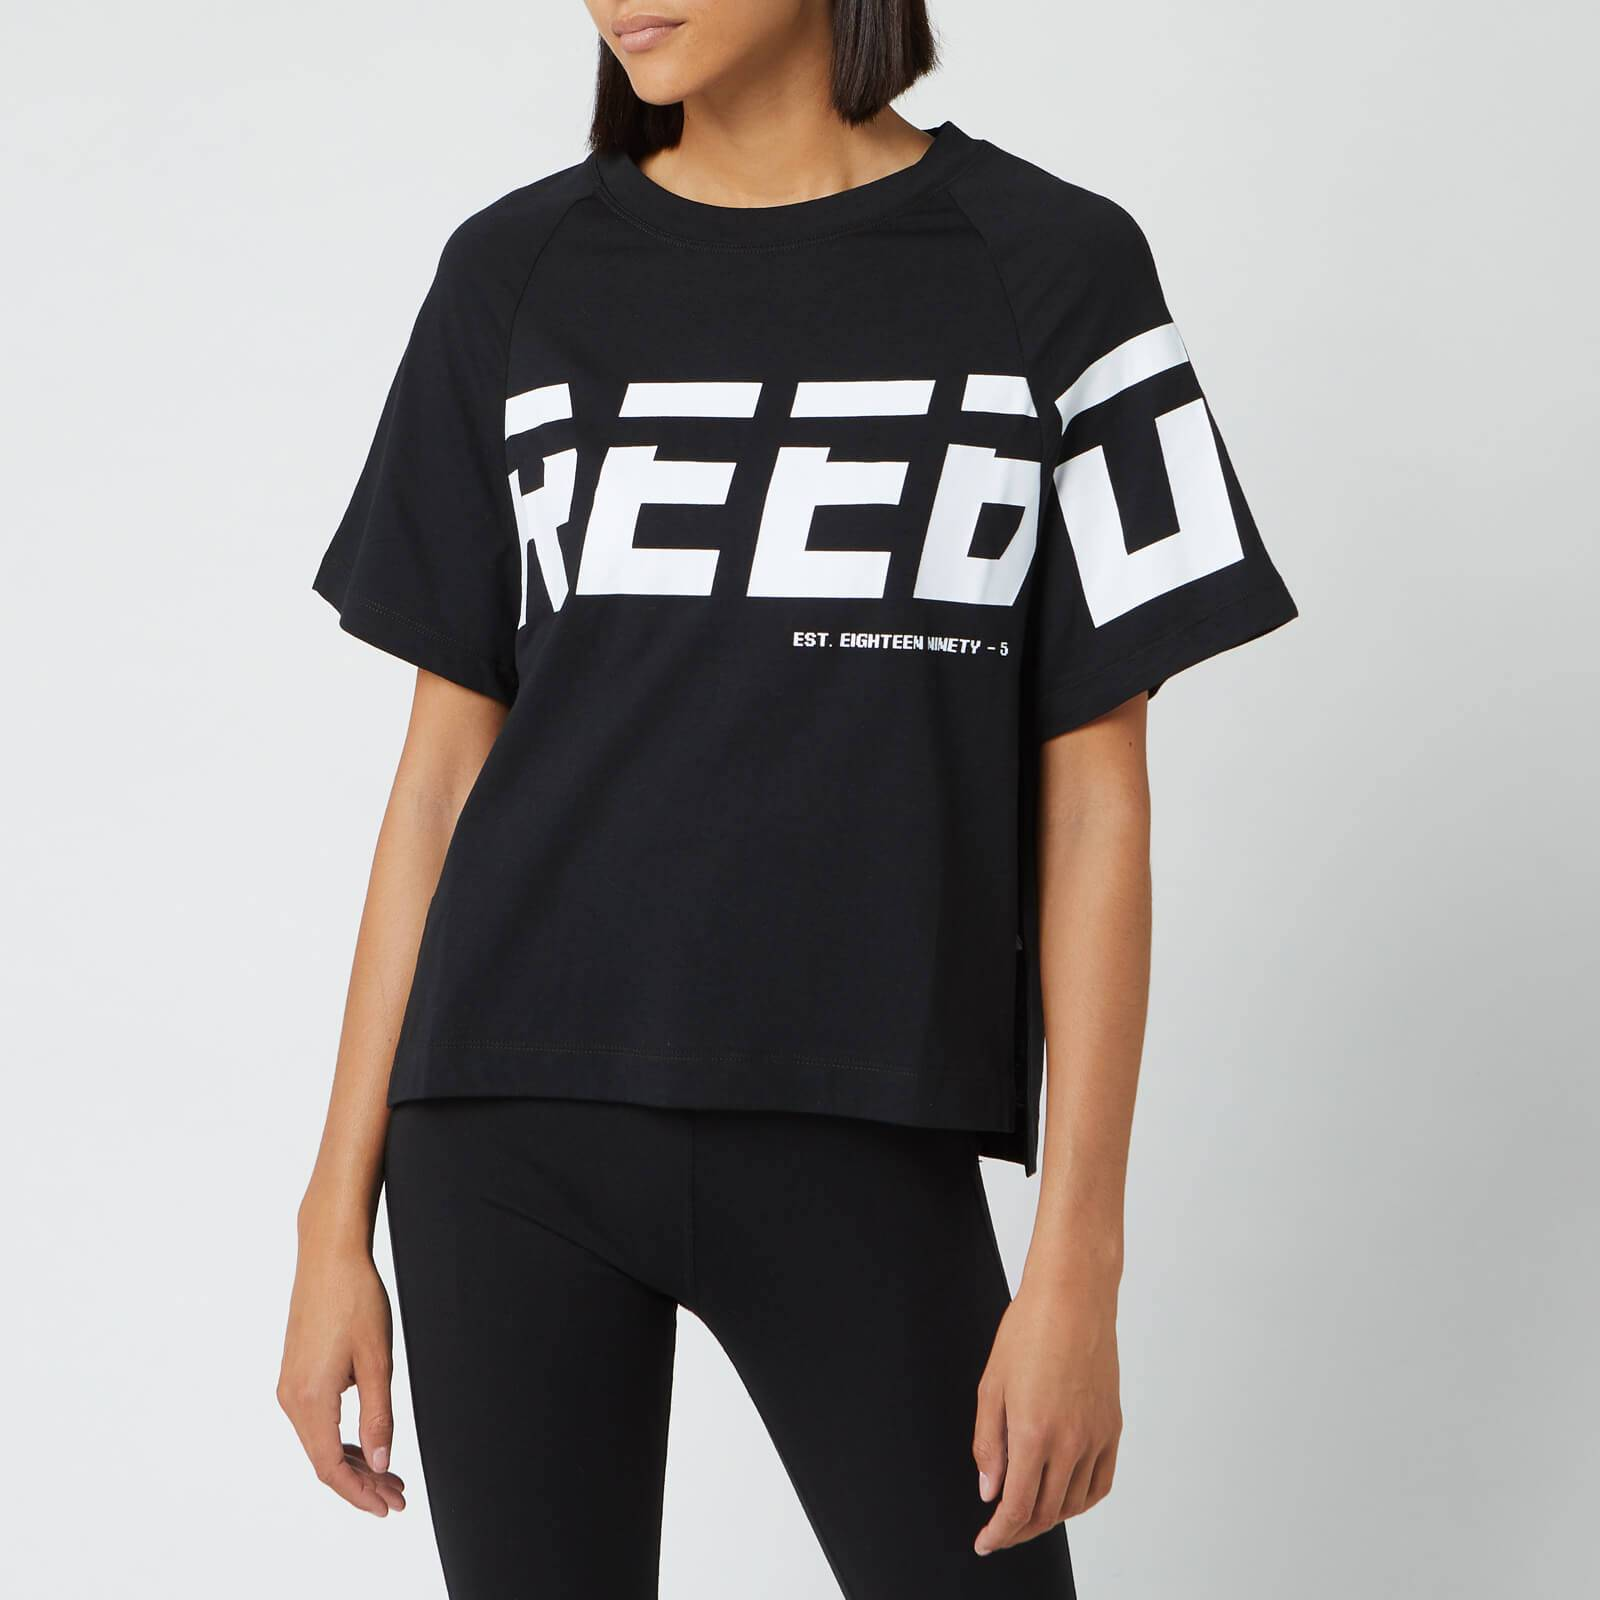 Reebok Women's WOR MYT Graphic Short Sleeve T-Shirt - Black - XS - Black